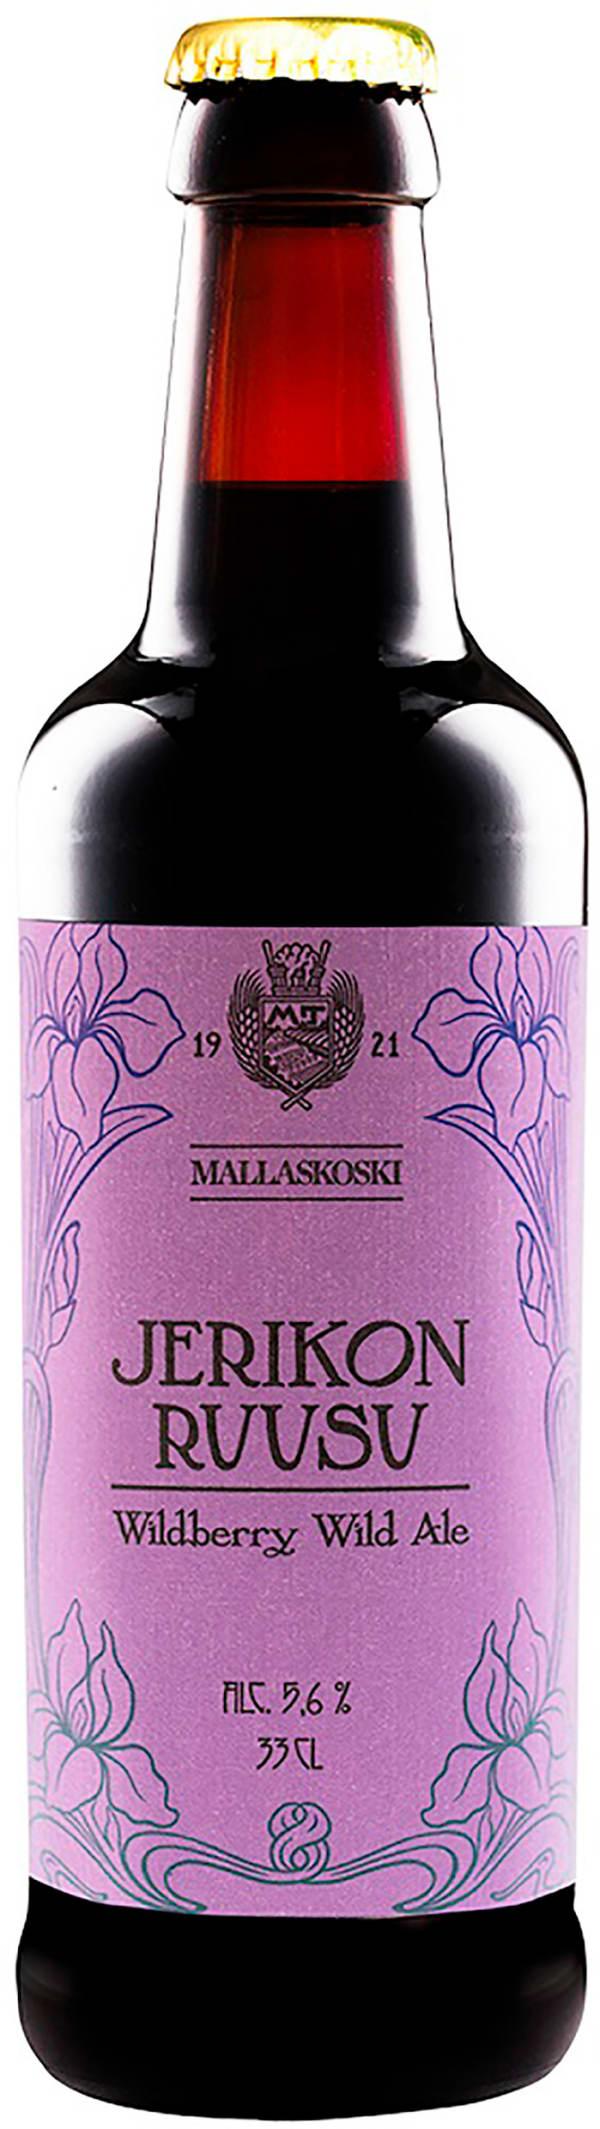 Mallaskoski Jerikon Ruusu Wildberry Wild Ale